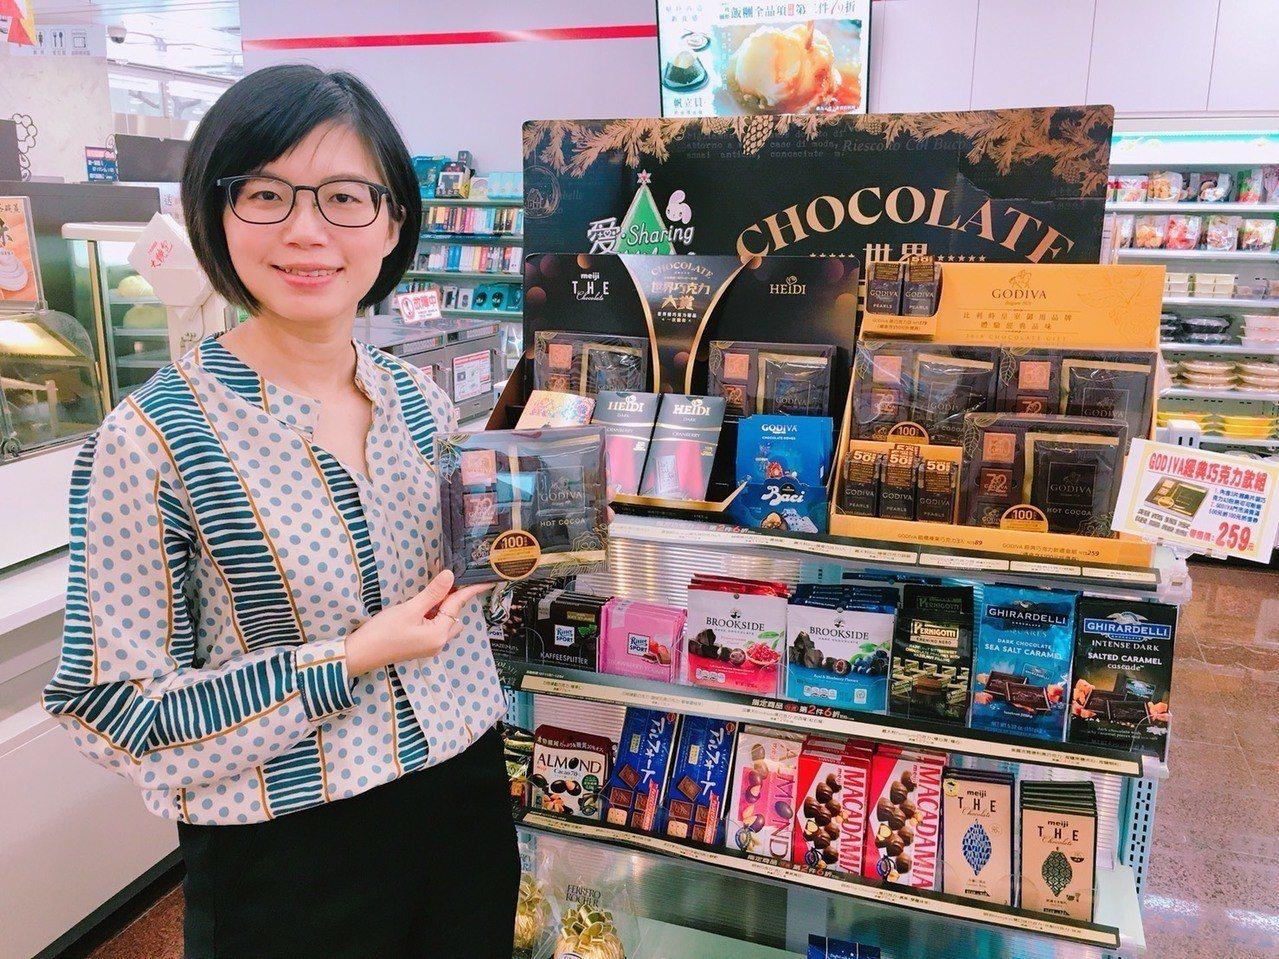 7-ELEVEN 門即 即日 起至 12/4 推出 「愛 sharing 世界 巧克力 賞 賞」, 集結 ...